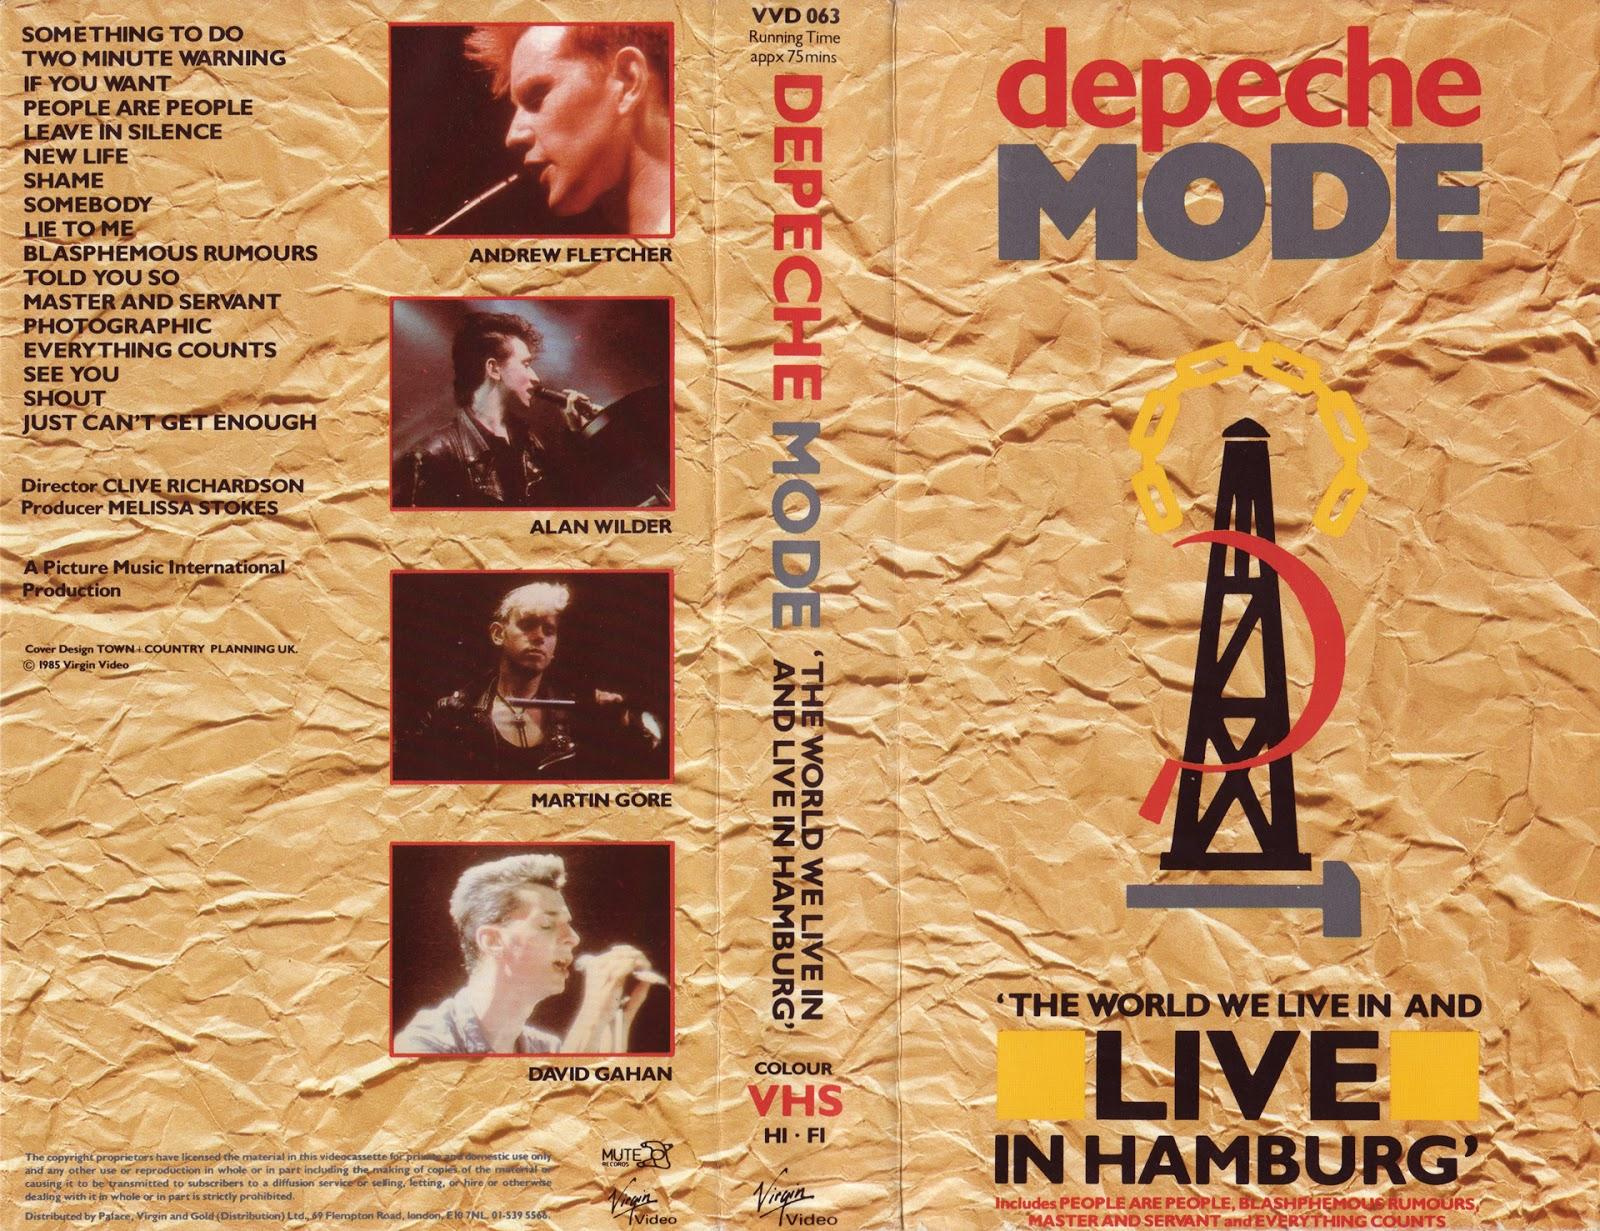 Dark Circle Room Depeche Mode Alsterdorfer Sporthalle Hamburg Germany Proshot